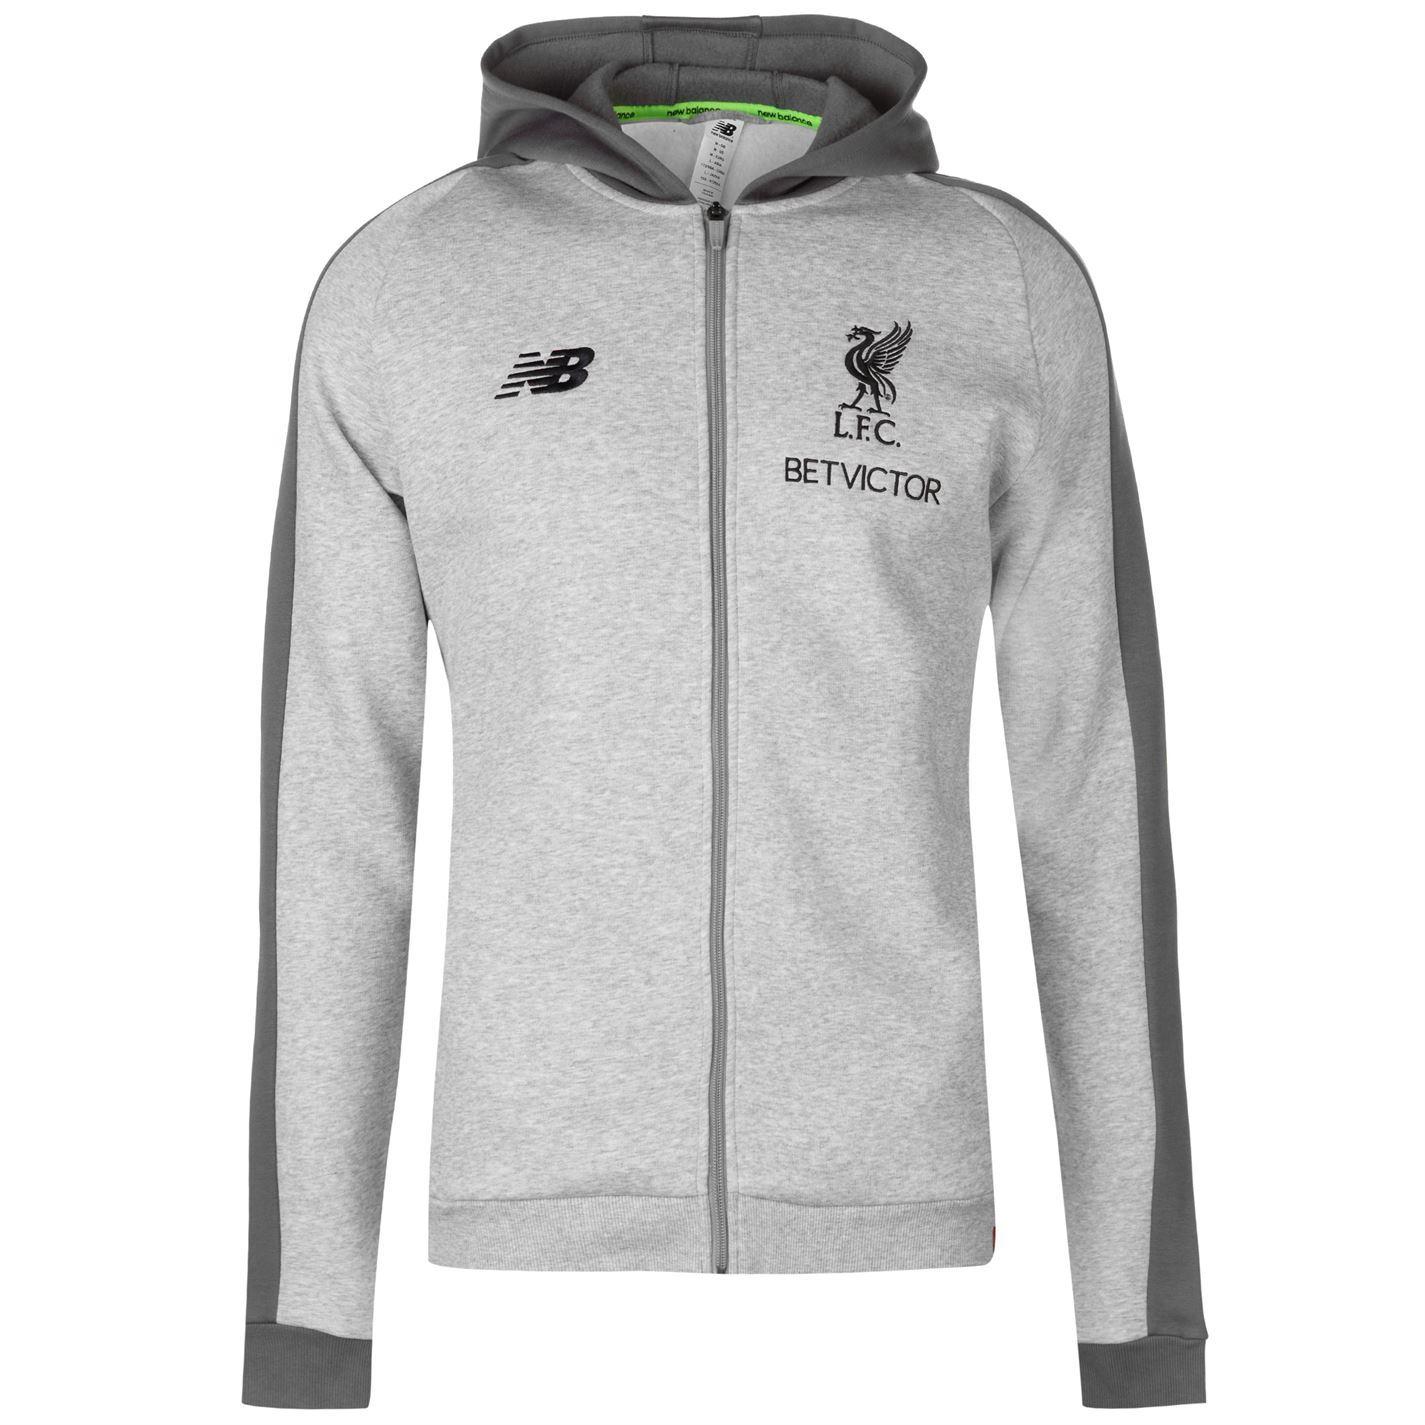 fc liverpool new balance hoodie